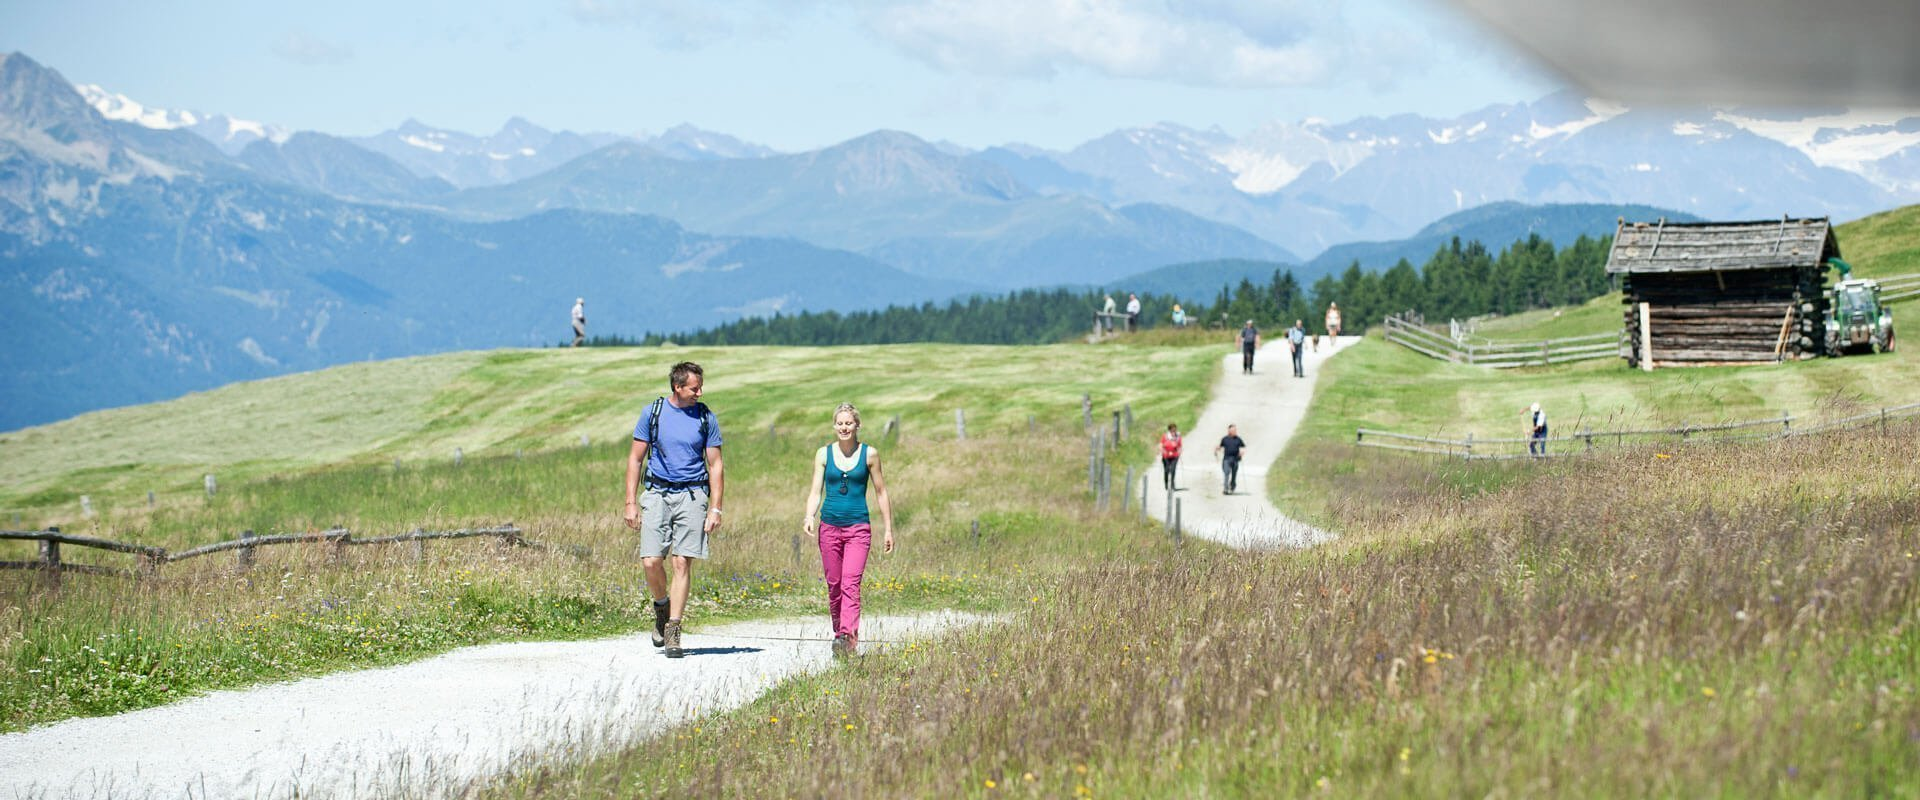 wanderurlaub-suedtirol-luesner-alm